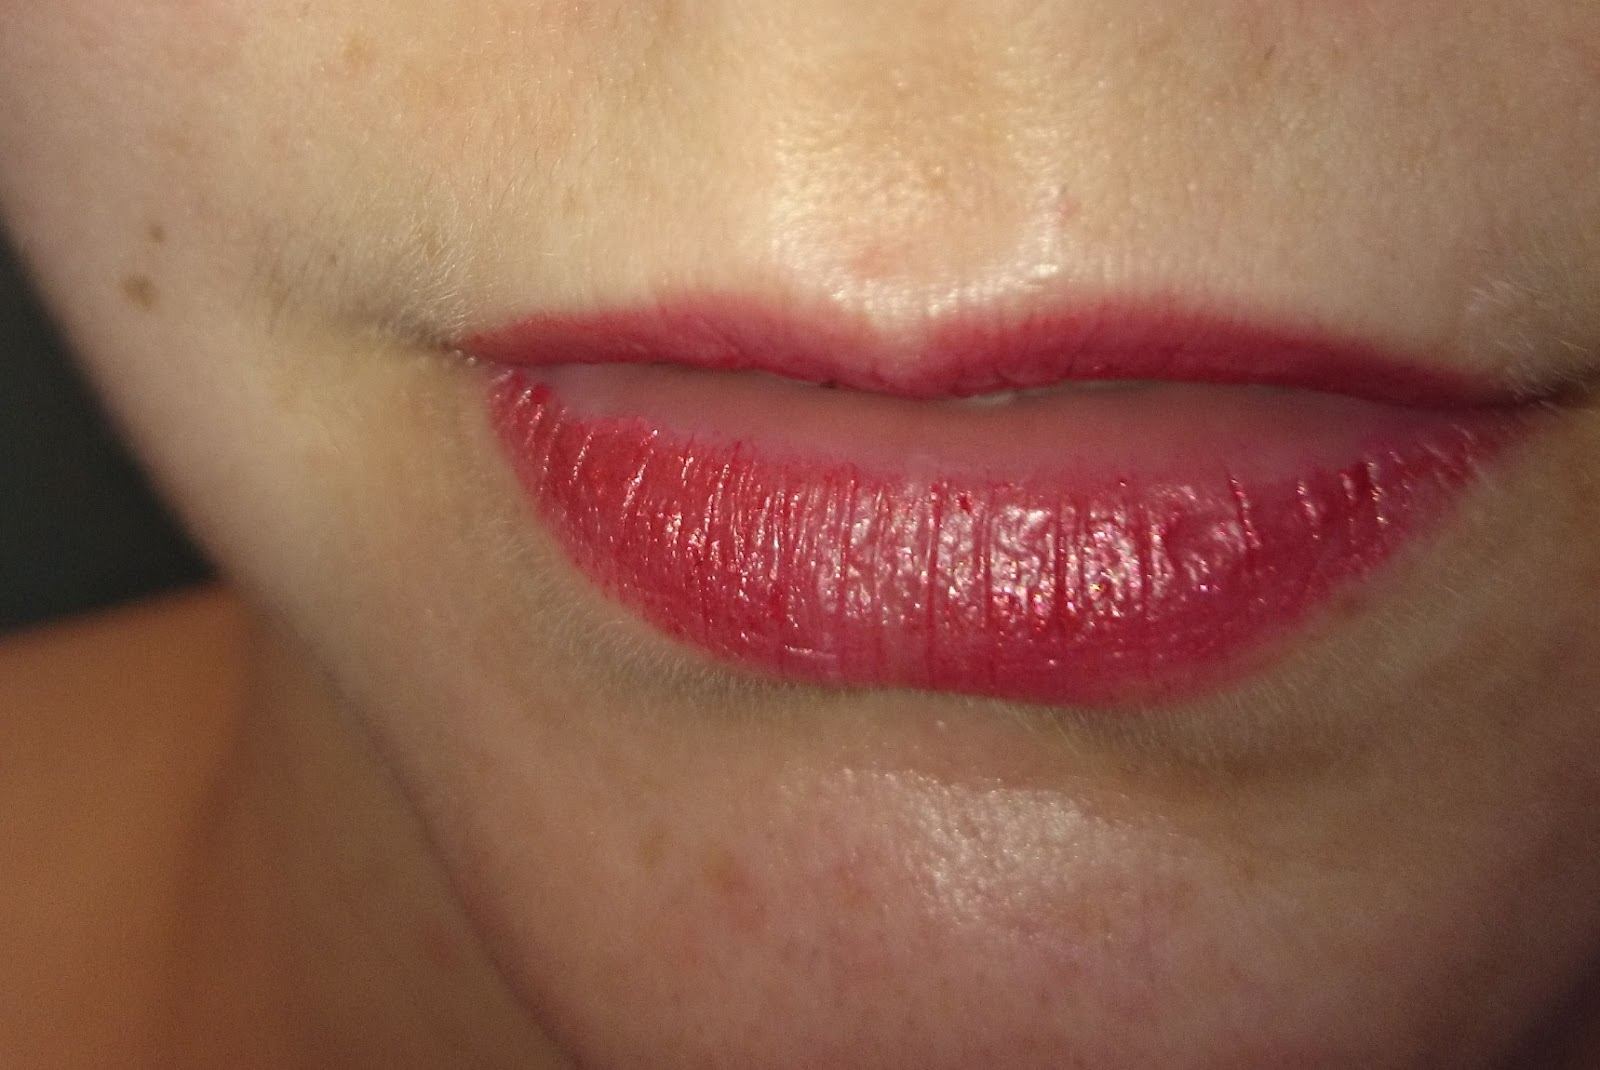 Mac Frost Lipstick Viva Glam Rihanna Tragebild nach 5h